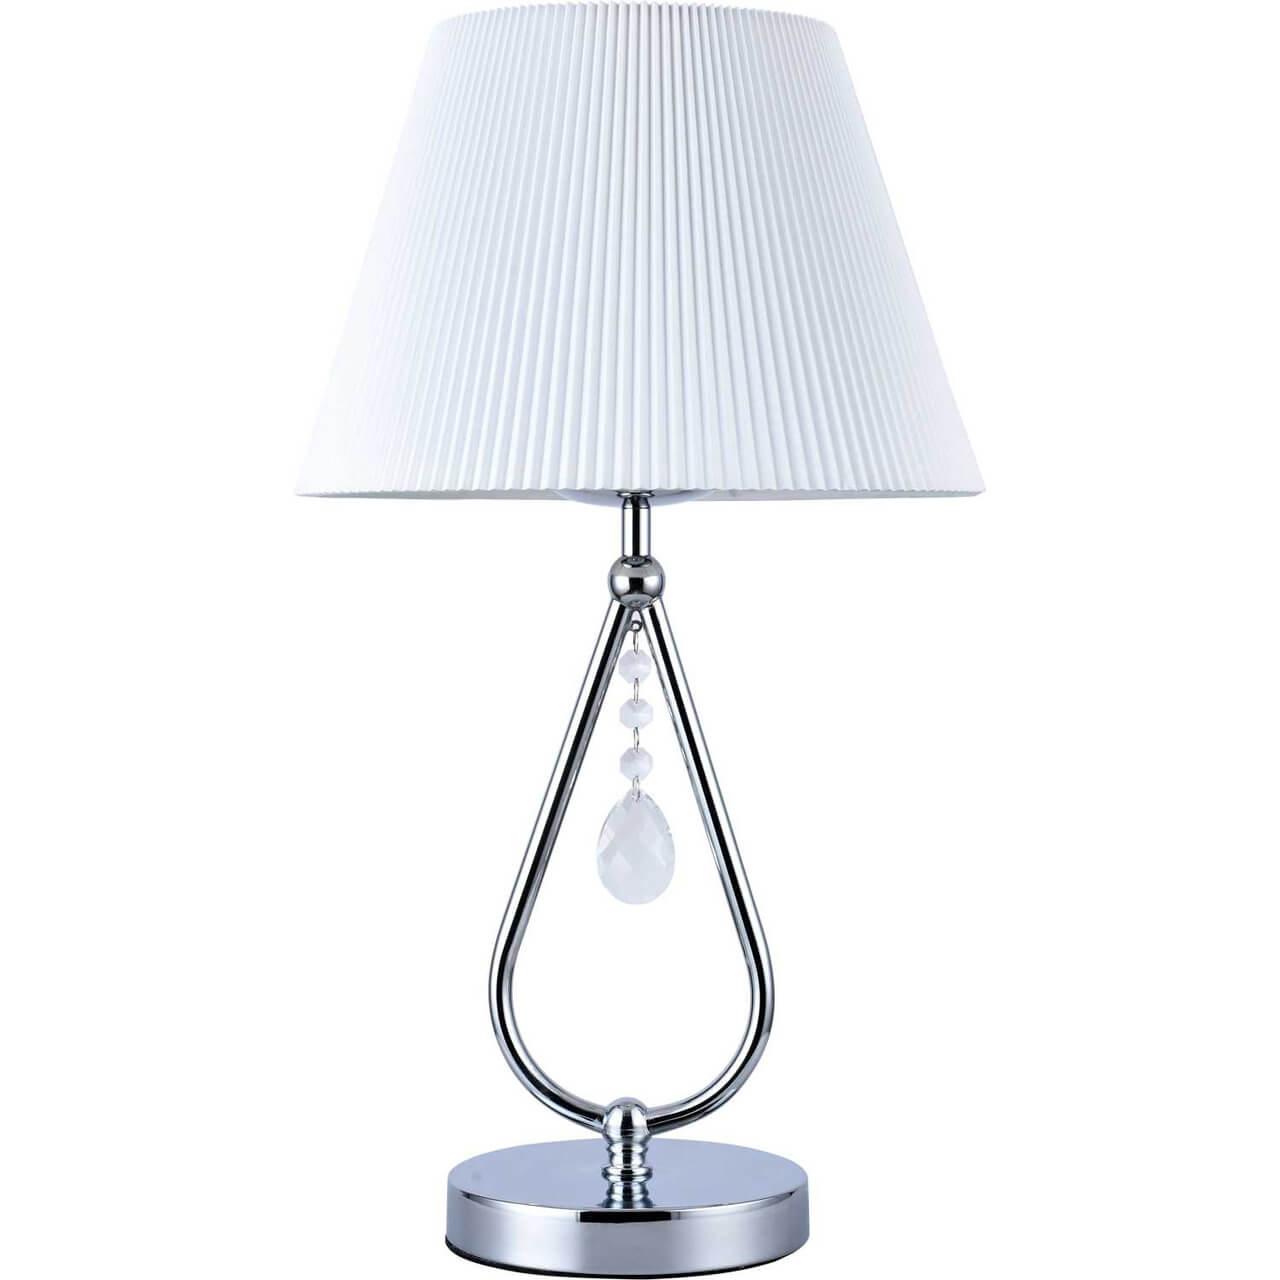 Настольная лампа Stilfort 1029/09/01T Savoy недорого